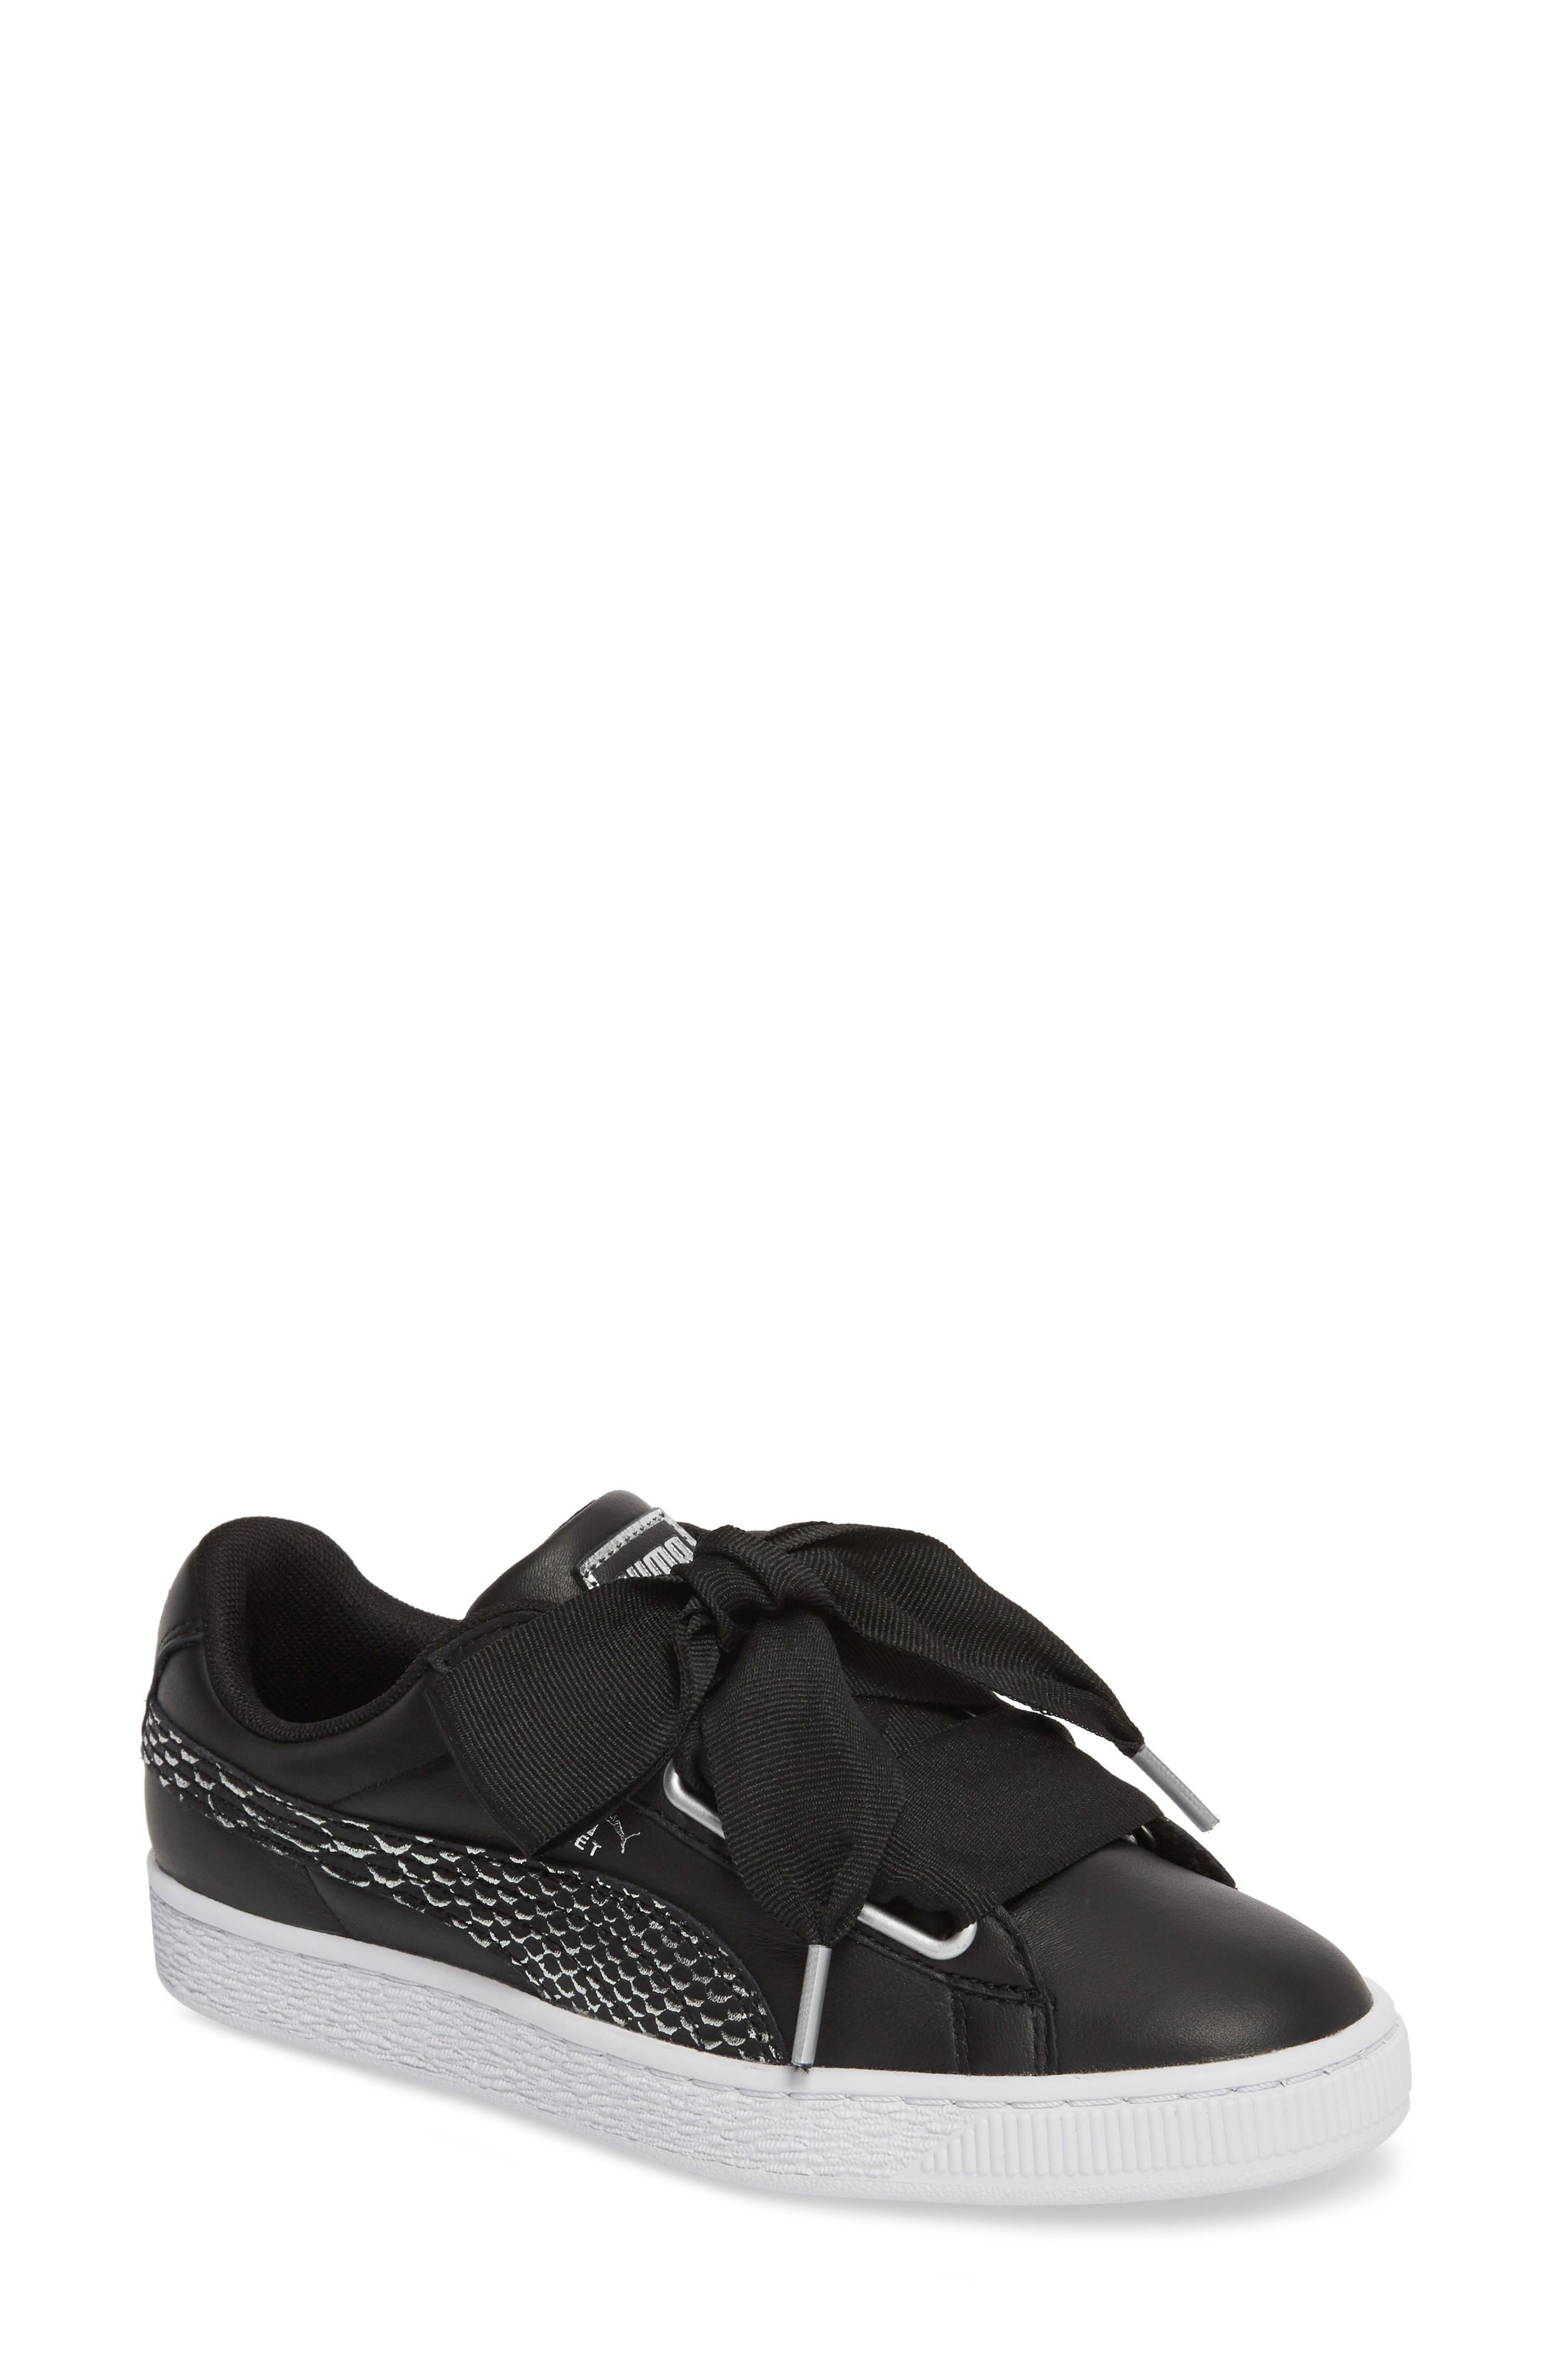 Puma Basket Heart Sneaker In Black/ White/ Black